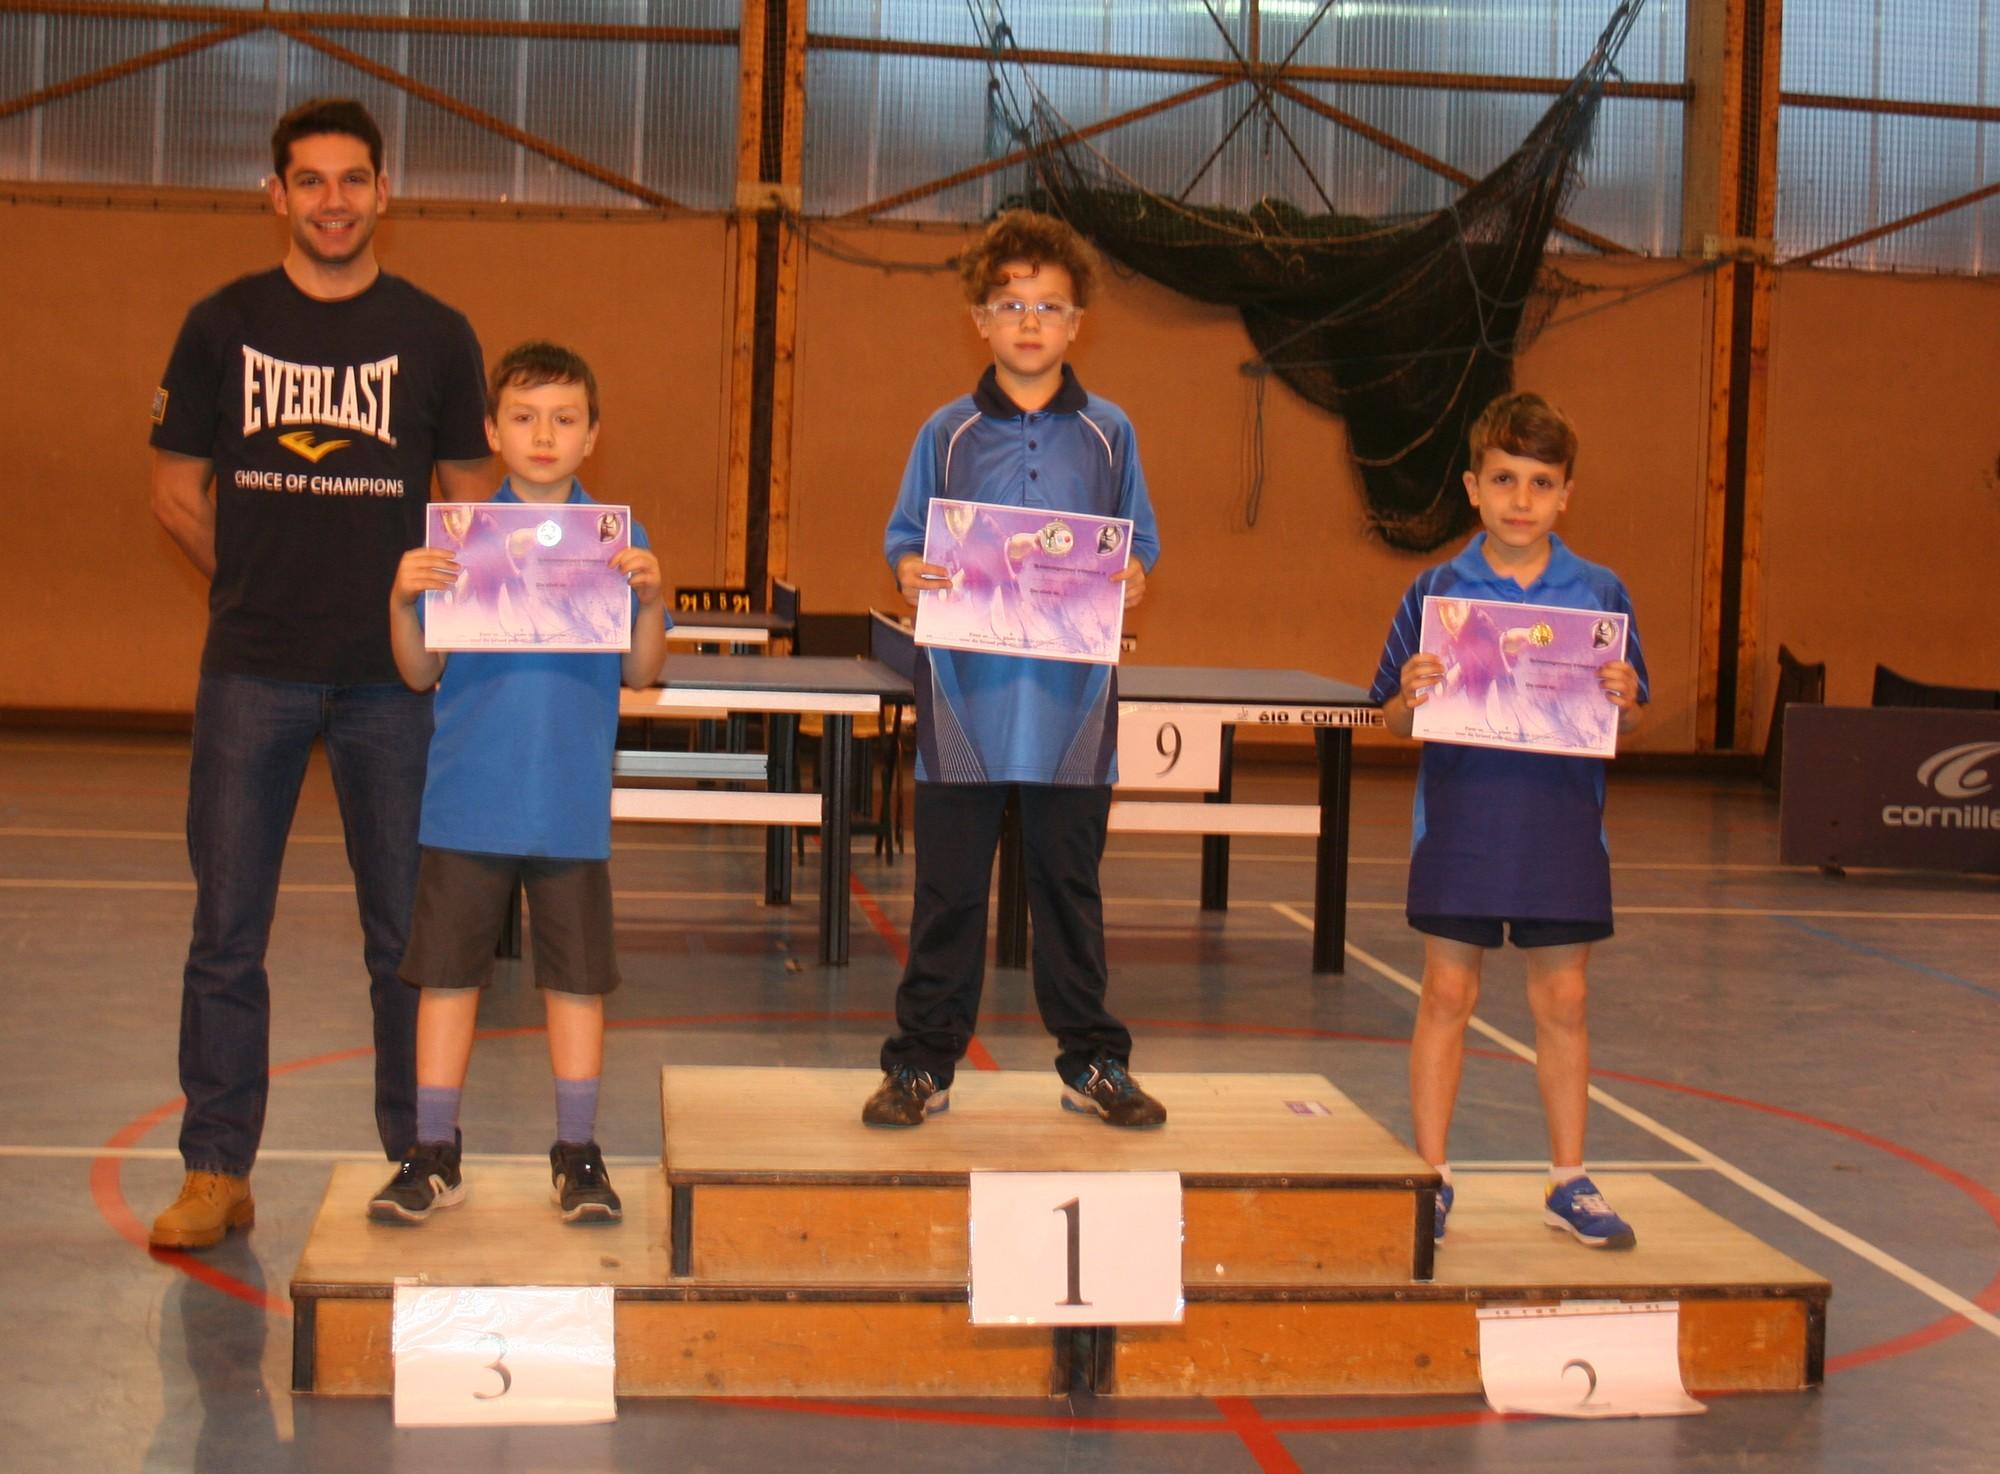 Chagny tennis de table resultats - Resultat tennis de table pro a ...